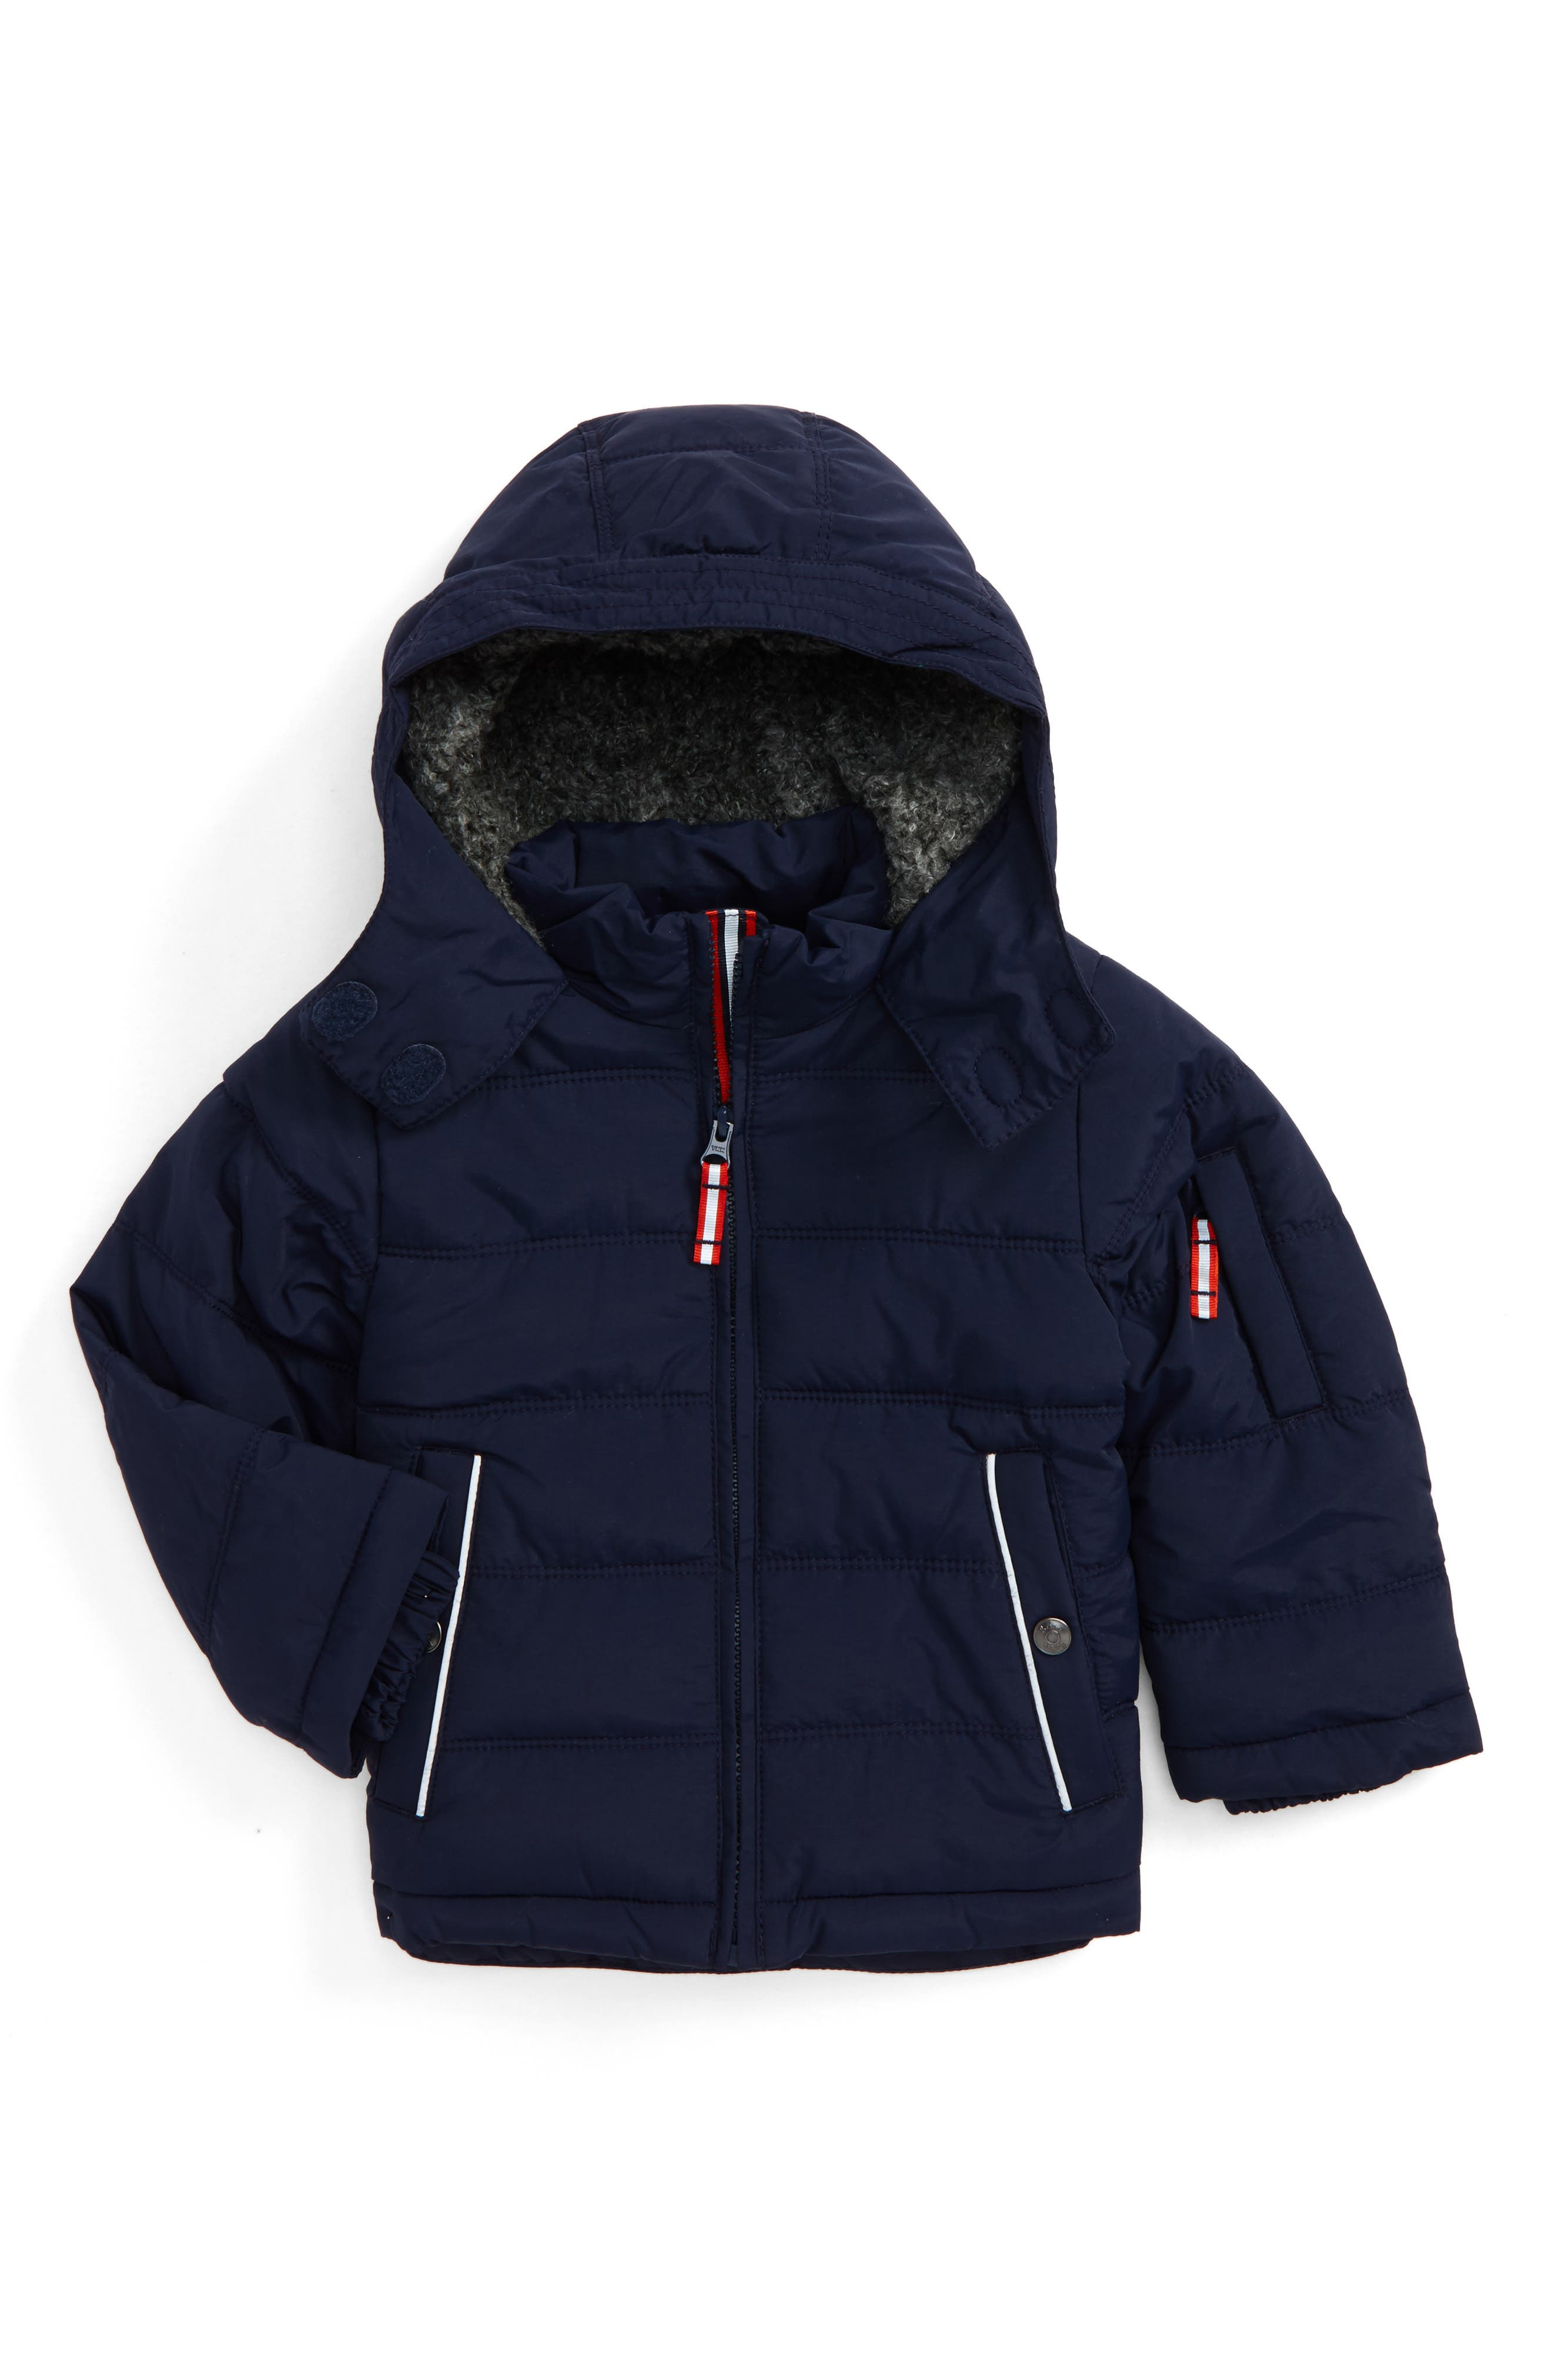 Main Image - Mini Boden Hooded Jacket (Toddler Boys, Little Boys & Big Boys)